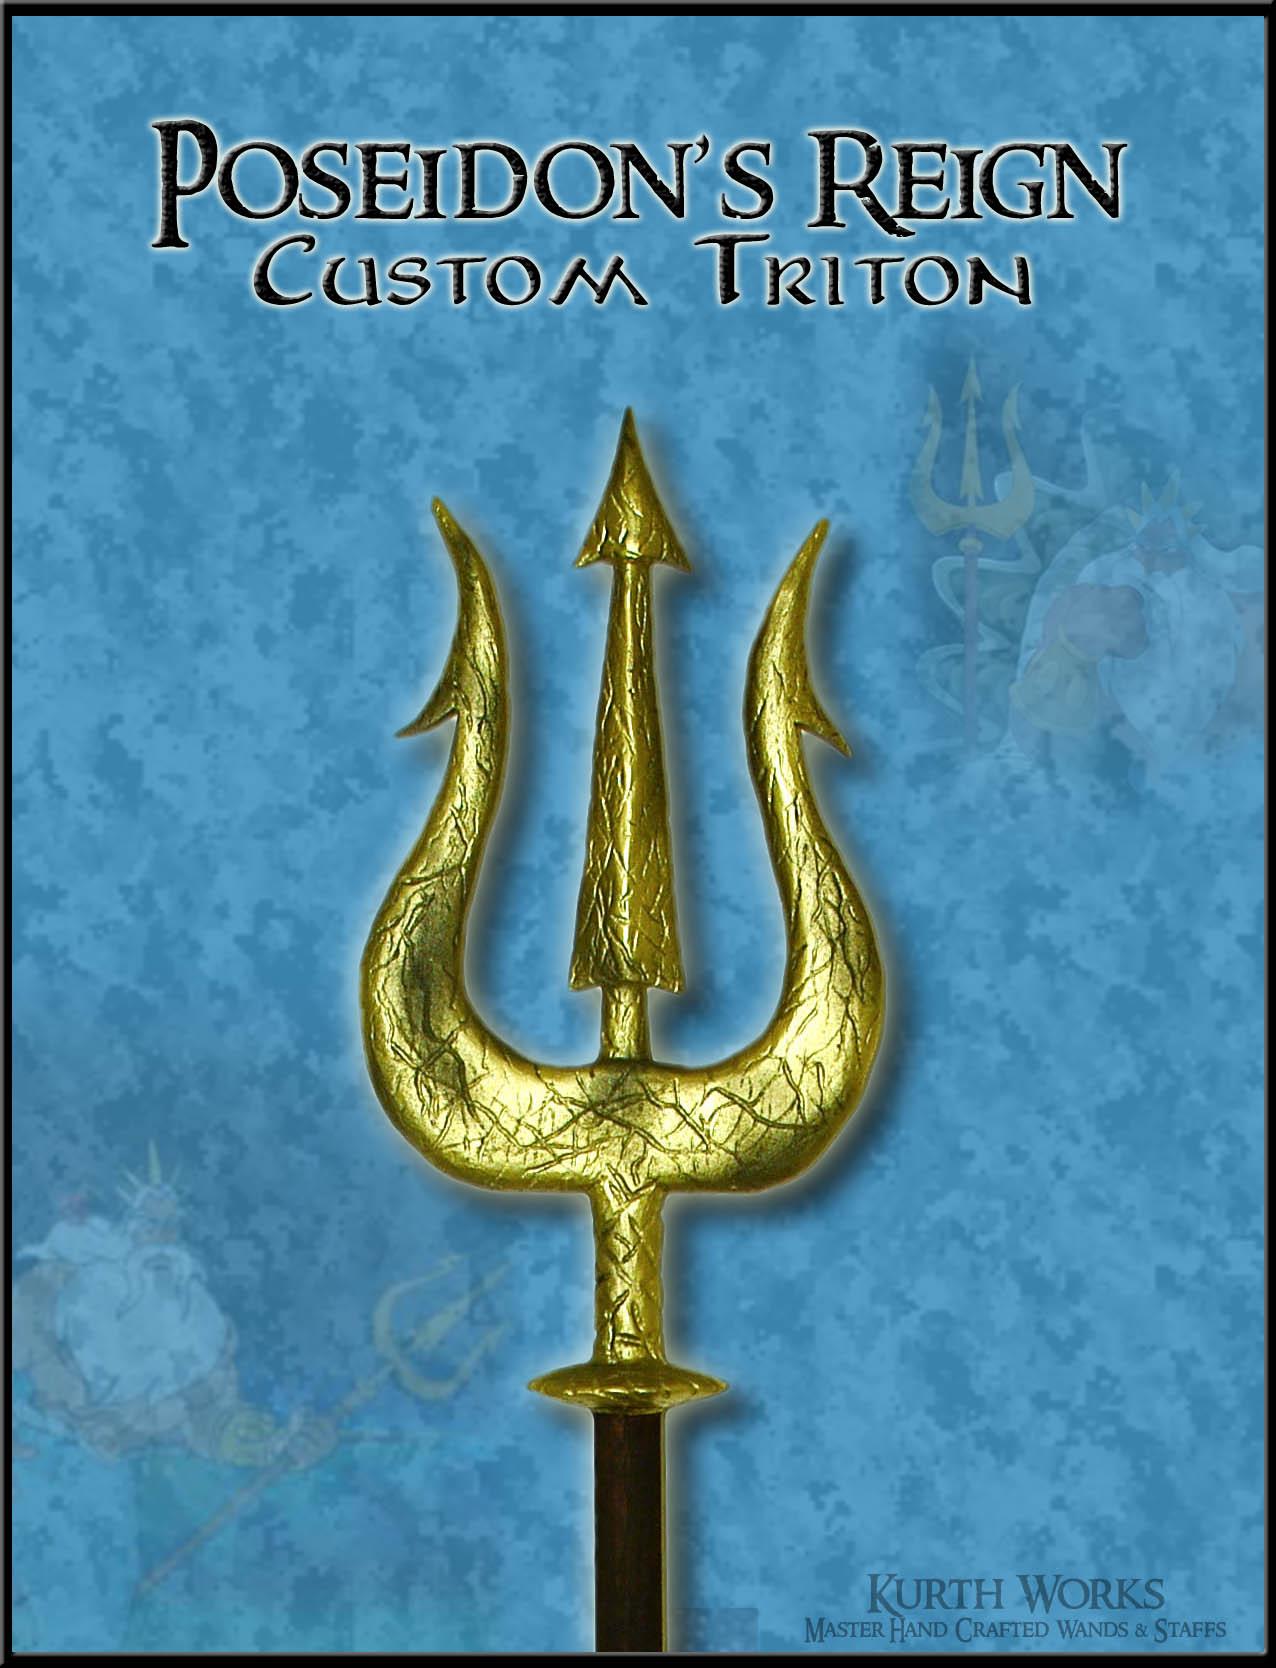 Wooden staff designs kurth works custom hand carved magic wizard wands - Fan Art Poseidon S Reign Custom Triton